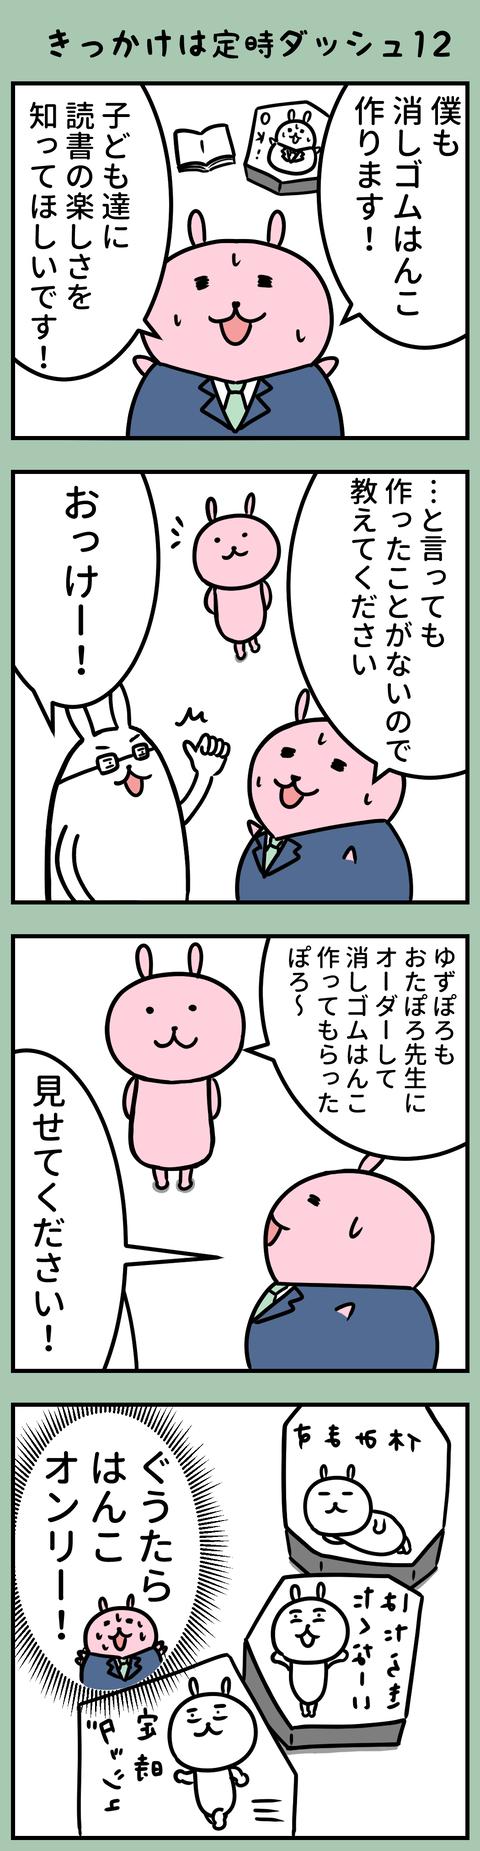 manga-yuzuporo61-1